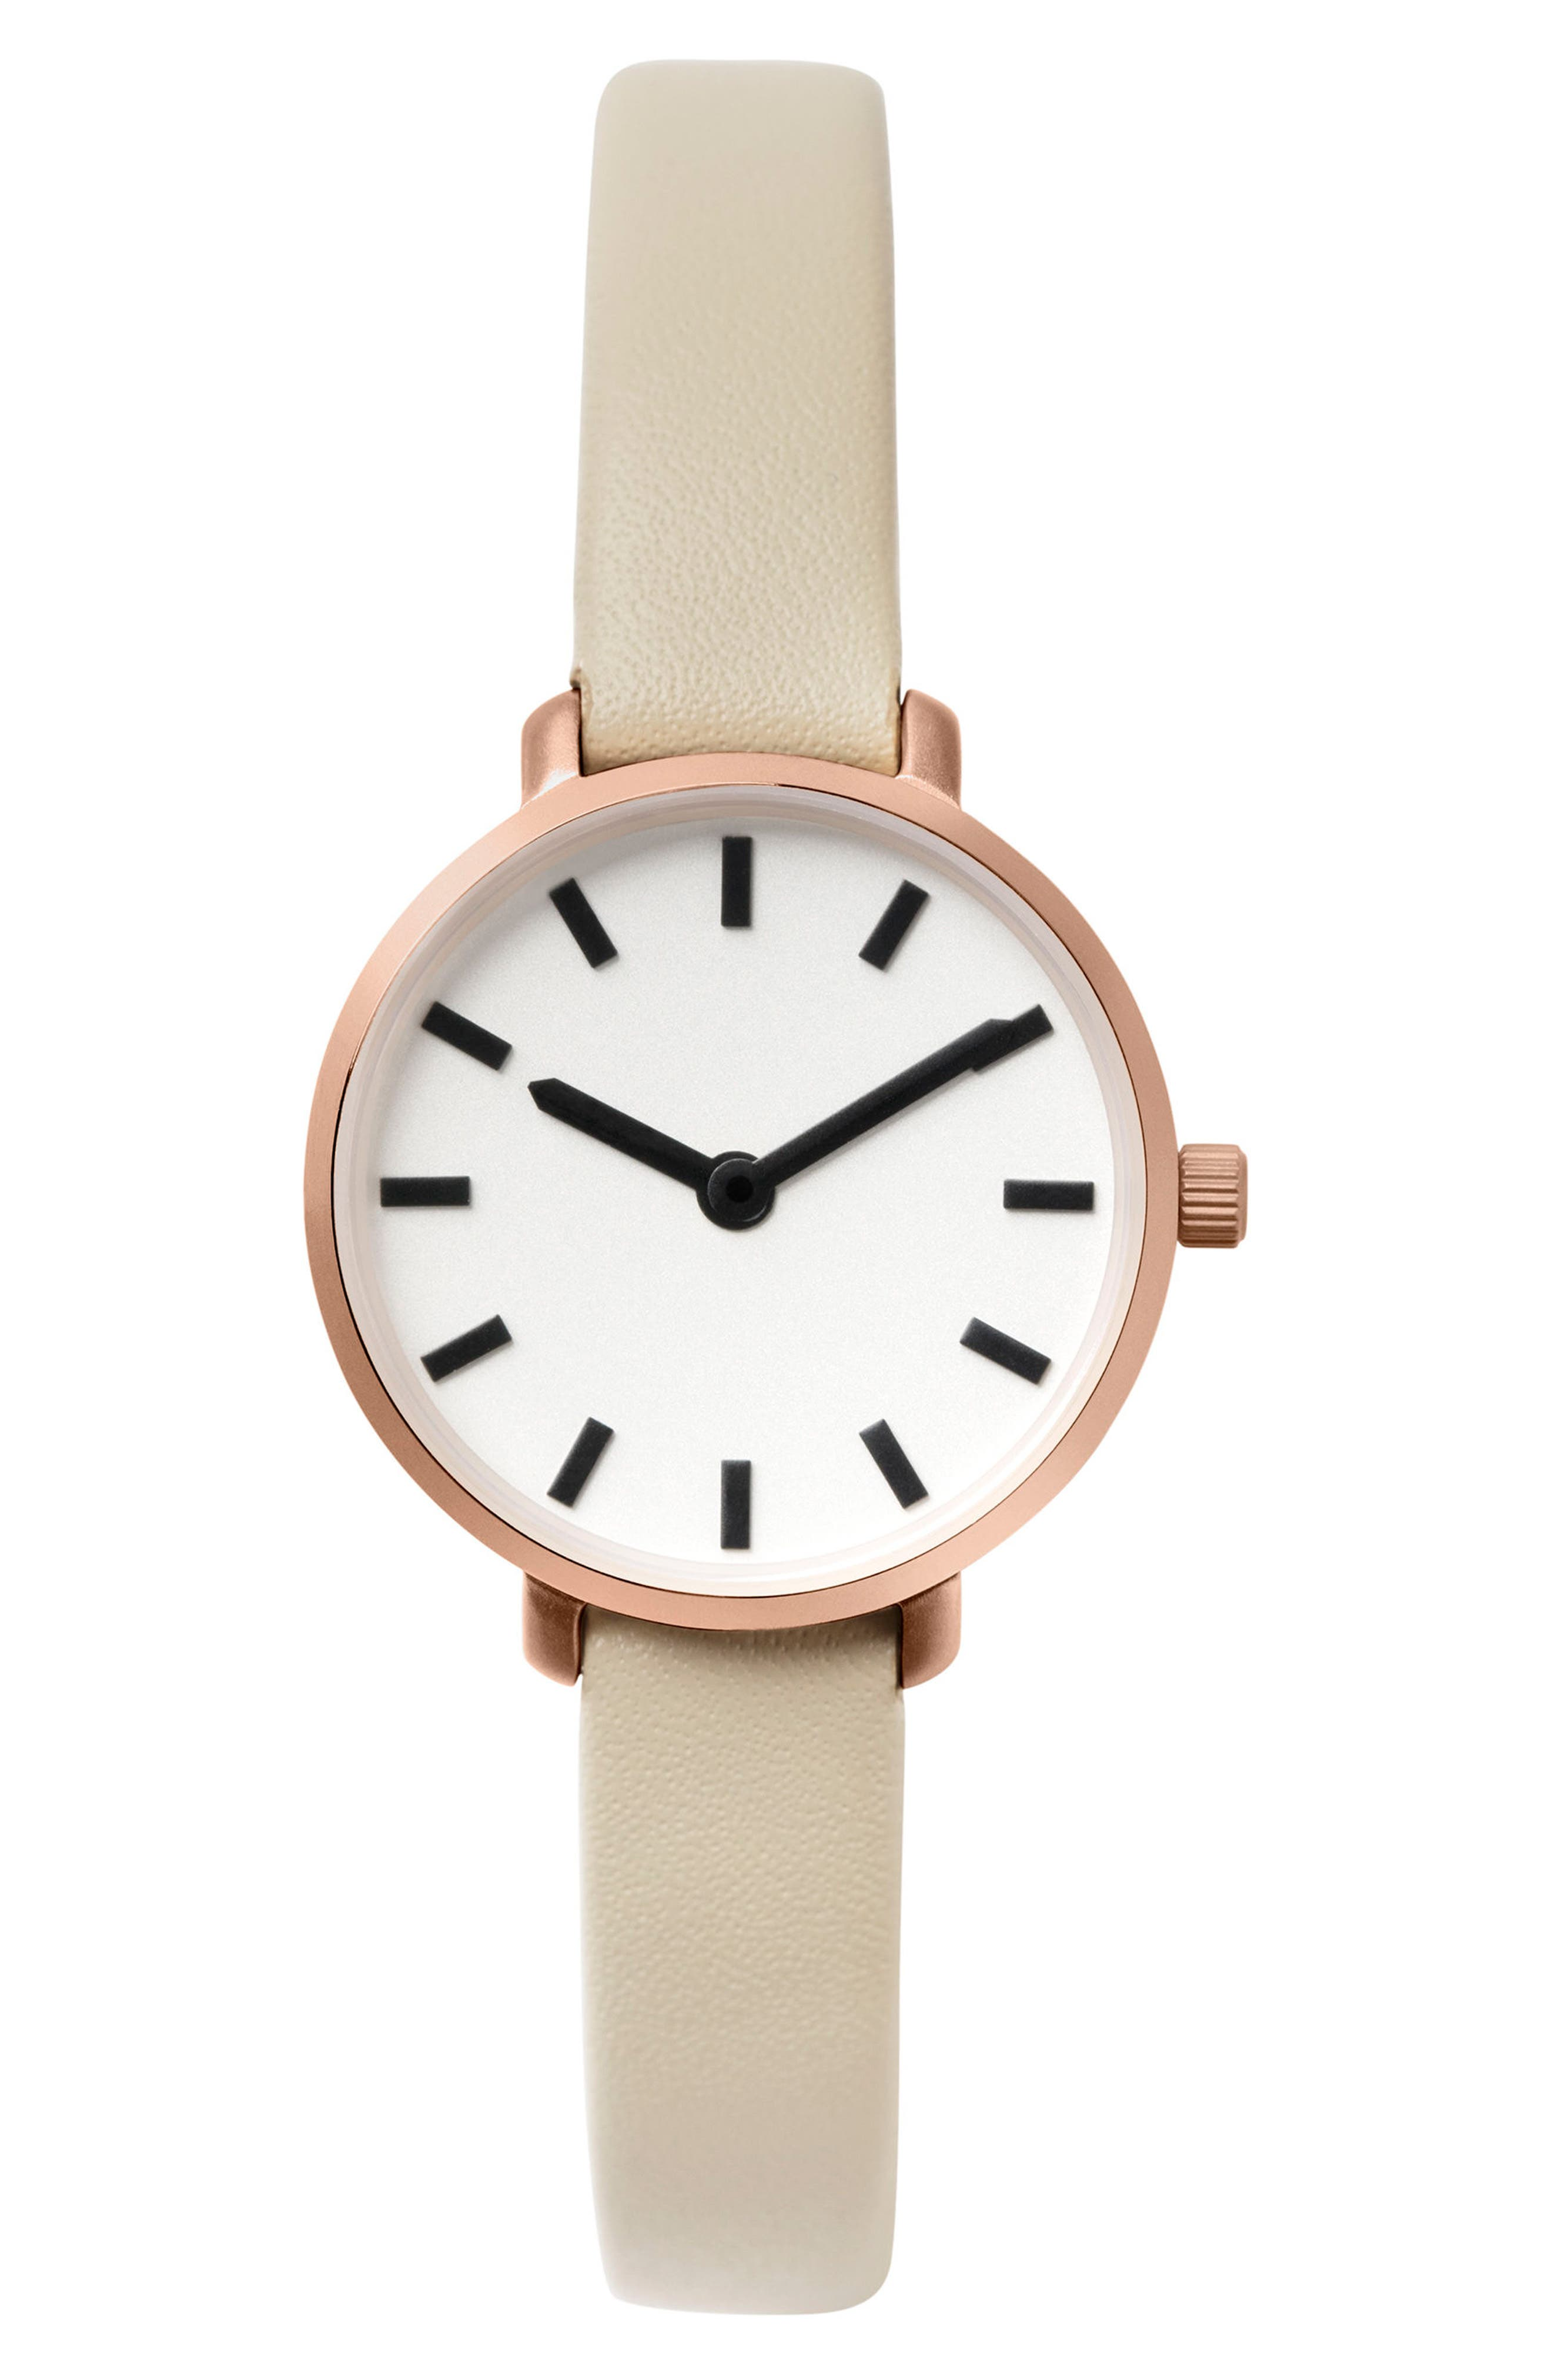 Main Image - BREDA Beverly Round Leather Strap Watch, 26mm